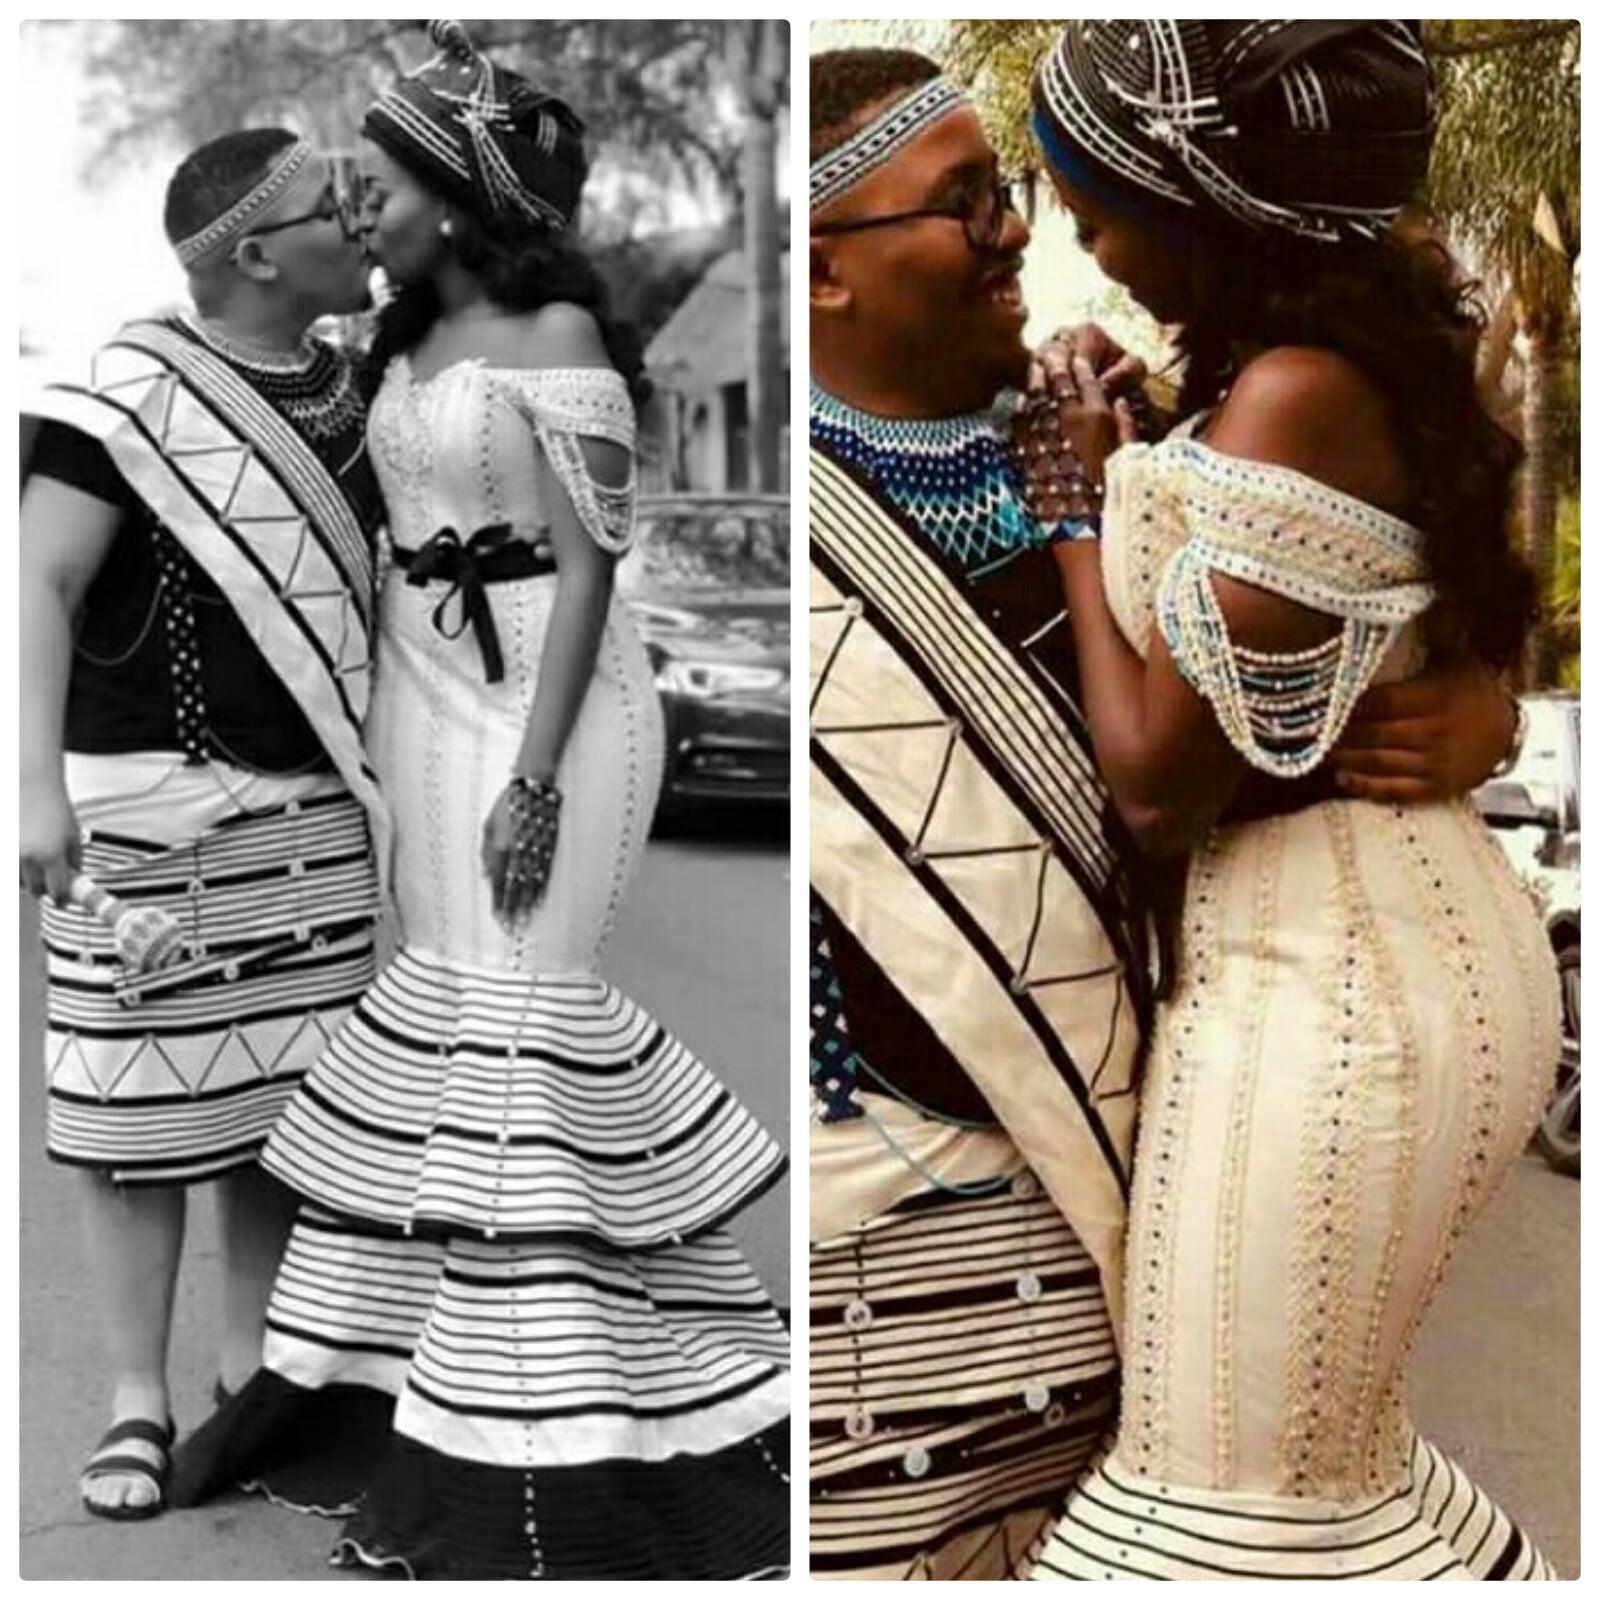 Xhosa Couple In Umbhaco Traditional Wedding Attire